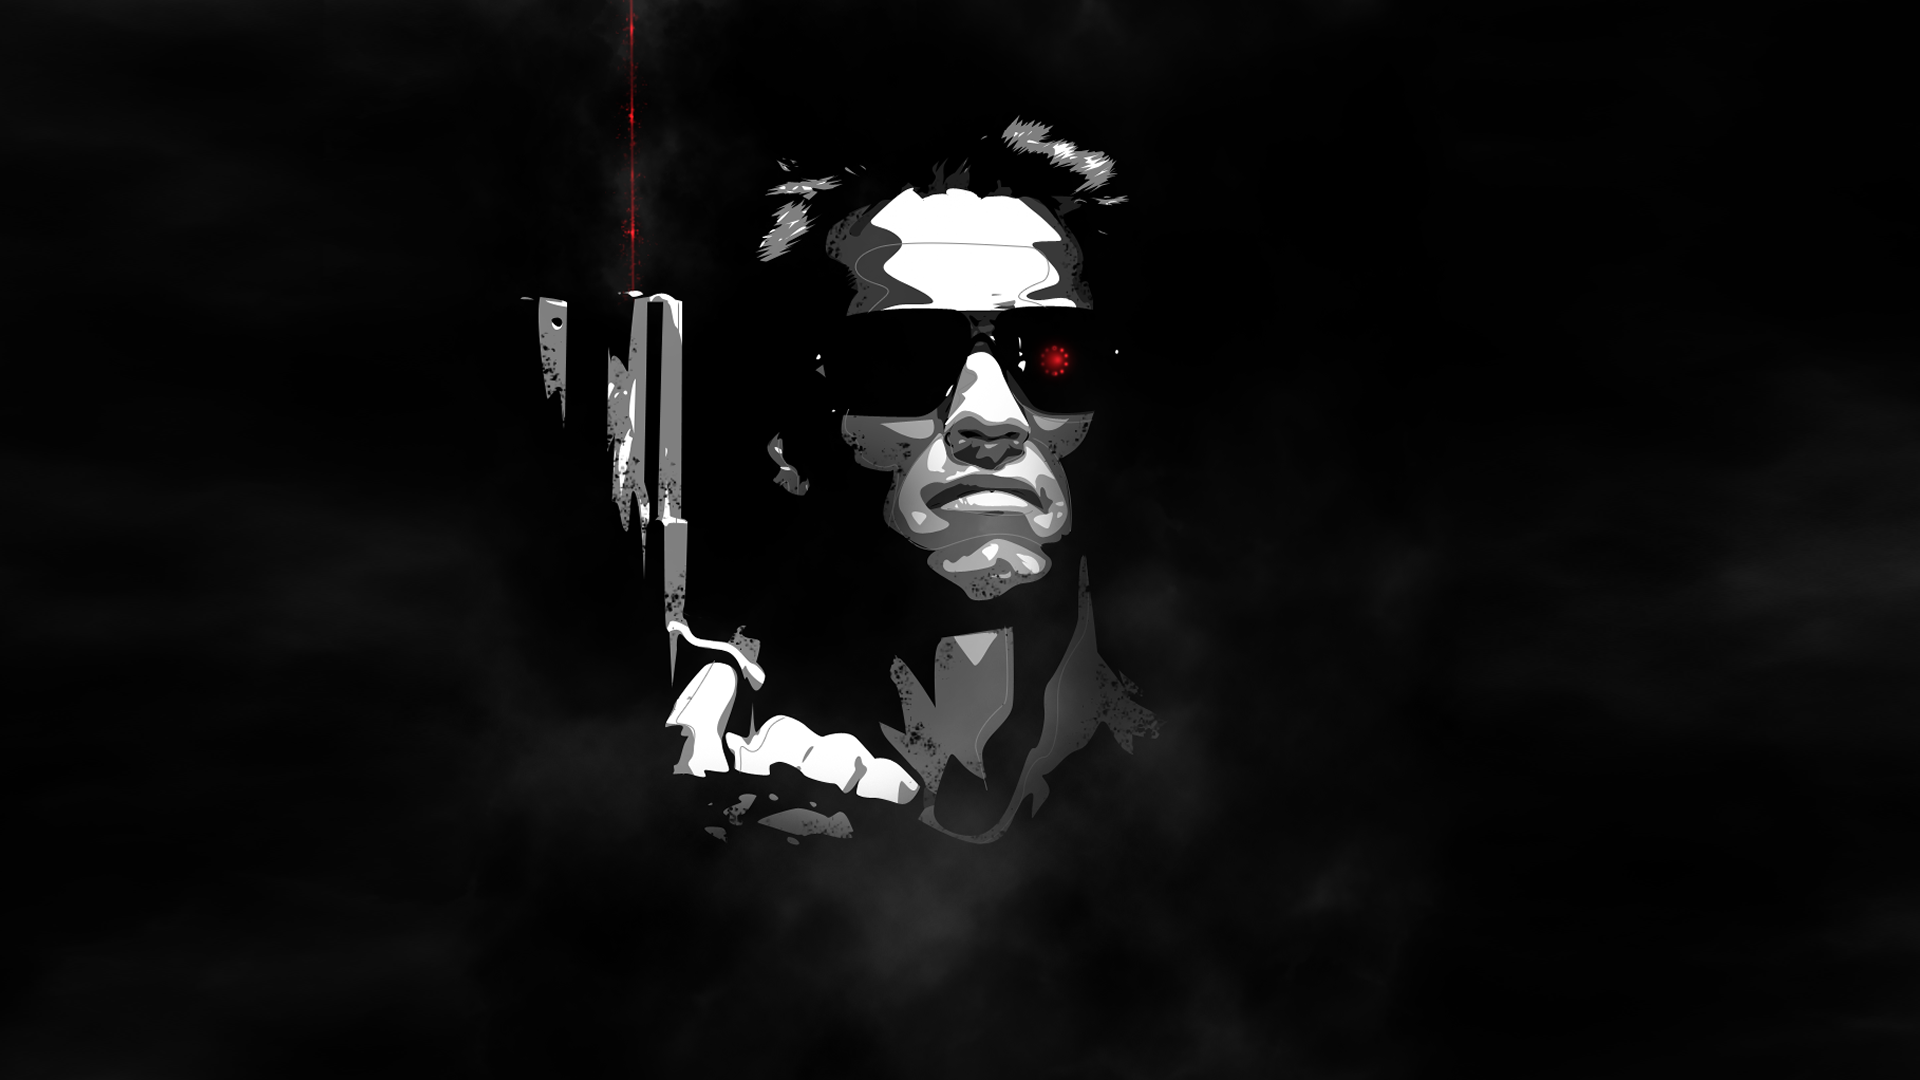 Free Terminator Wallpapers 1080p (avec images) Fond ecran